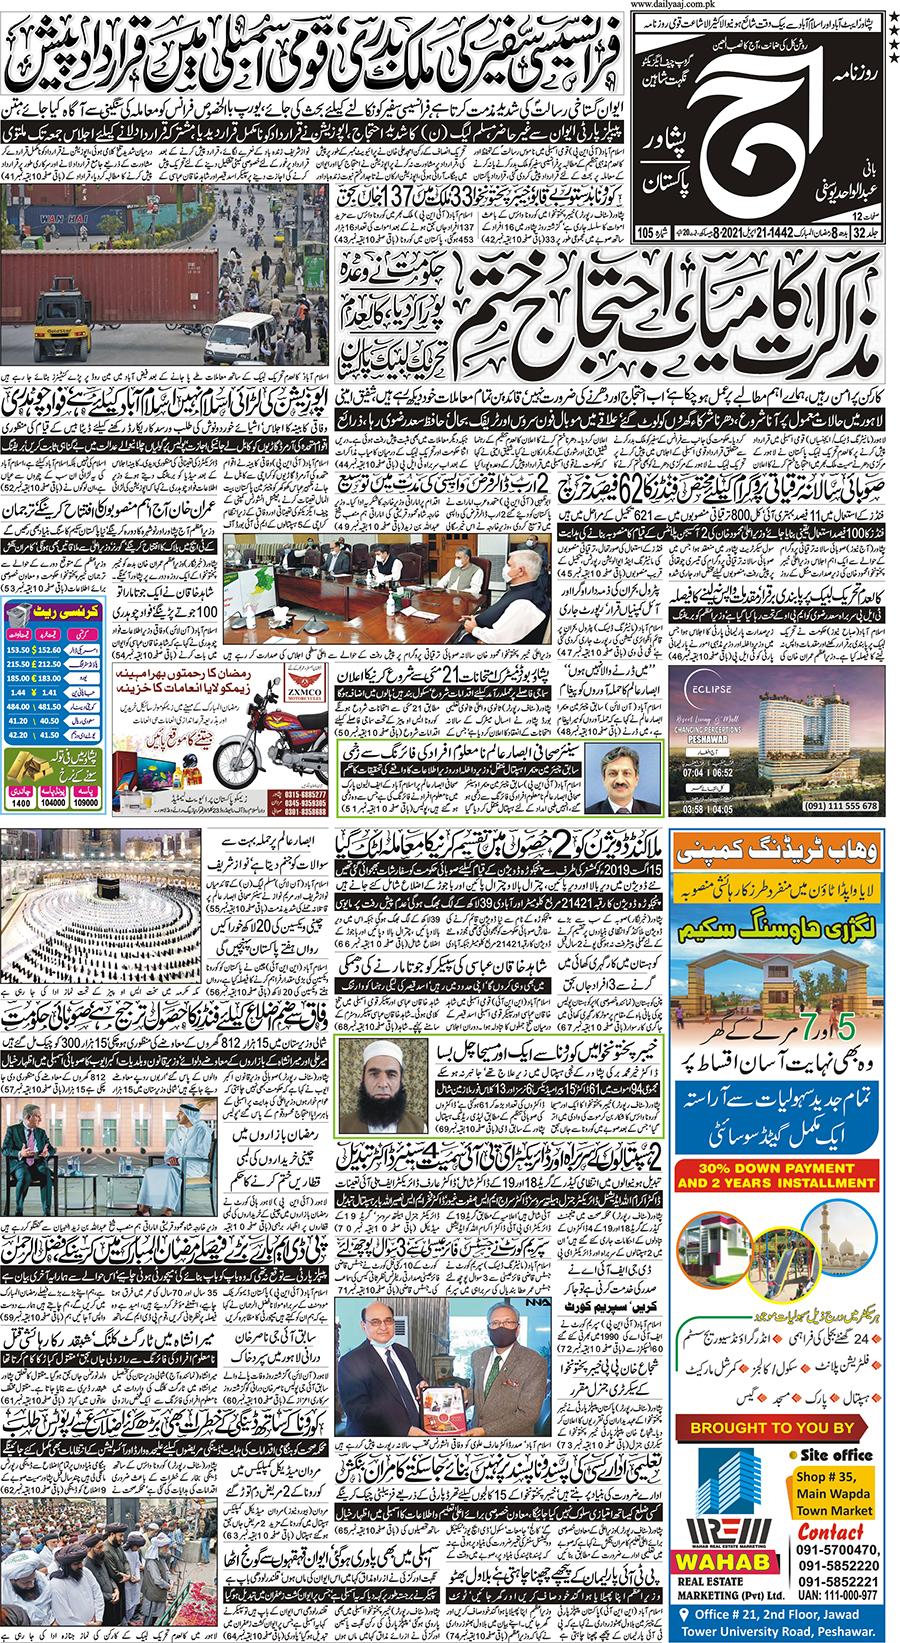 Epaper | 21 April, 2021 | Peshawar | Front Page | Daily Aaj